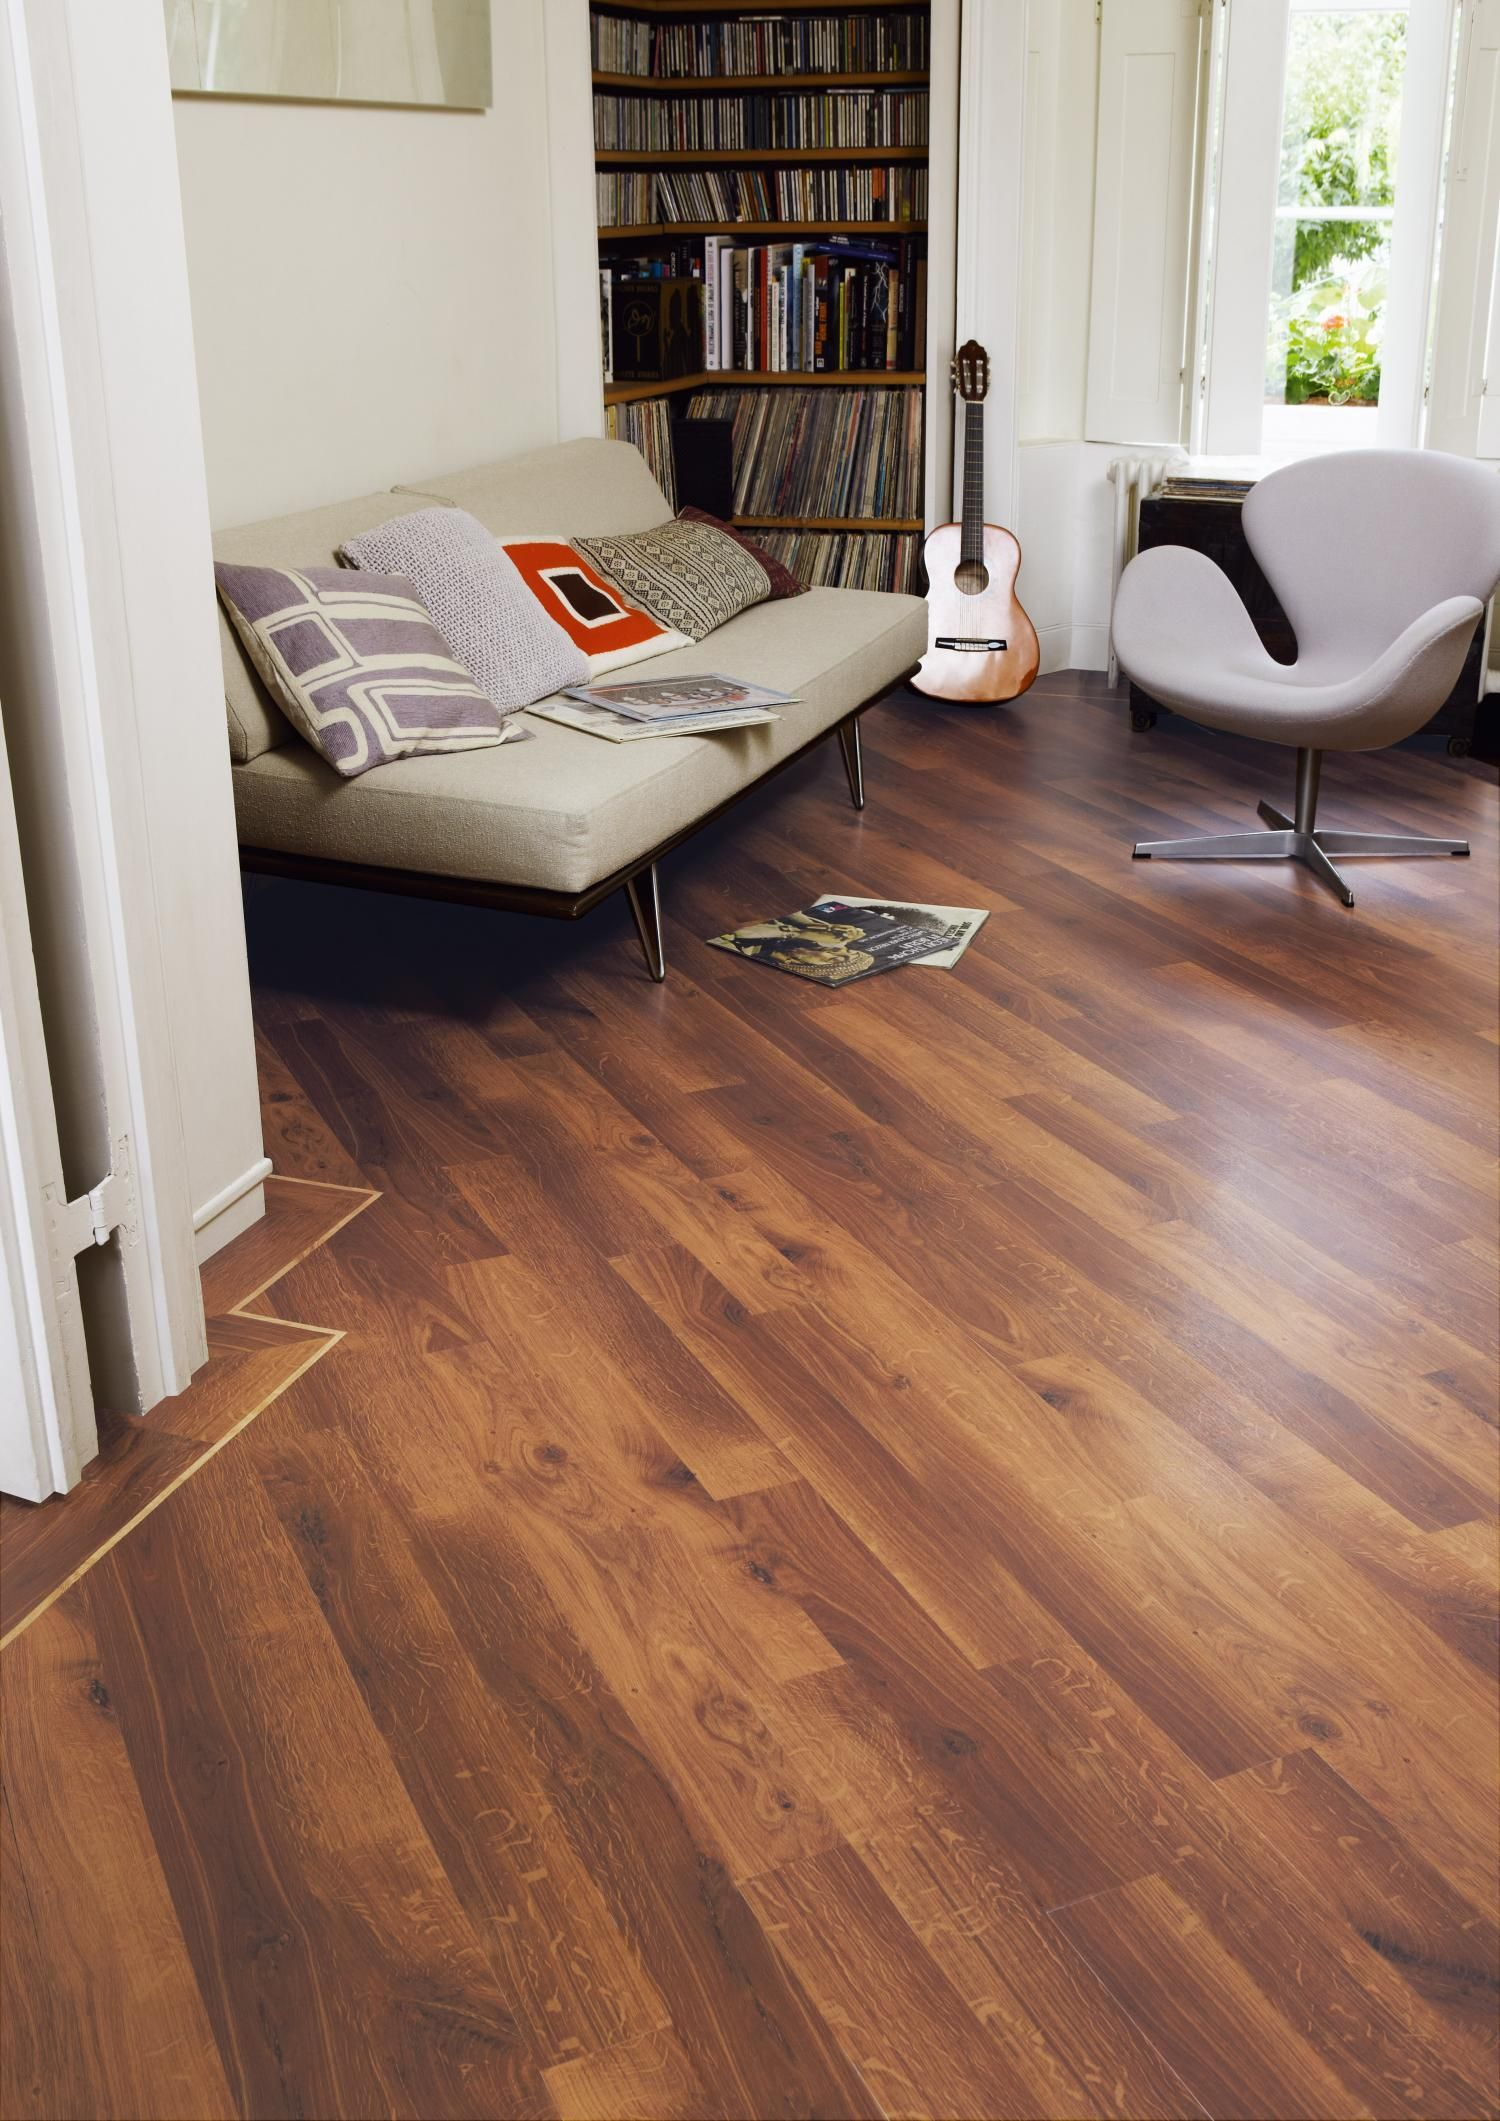 Karndean vinyl plank flooring prices smoked oak karndean knight karndean vinyl plank flooring prices smoked oak karndean knight tile edwardian oak vinyl flooring dailygadgetfo Gallery